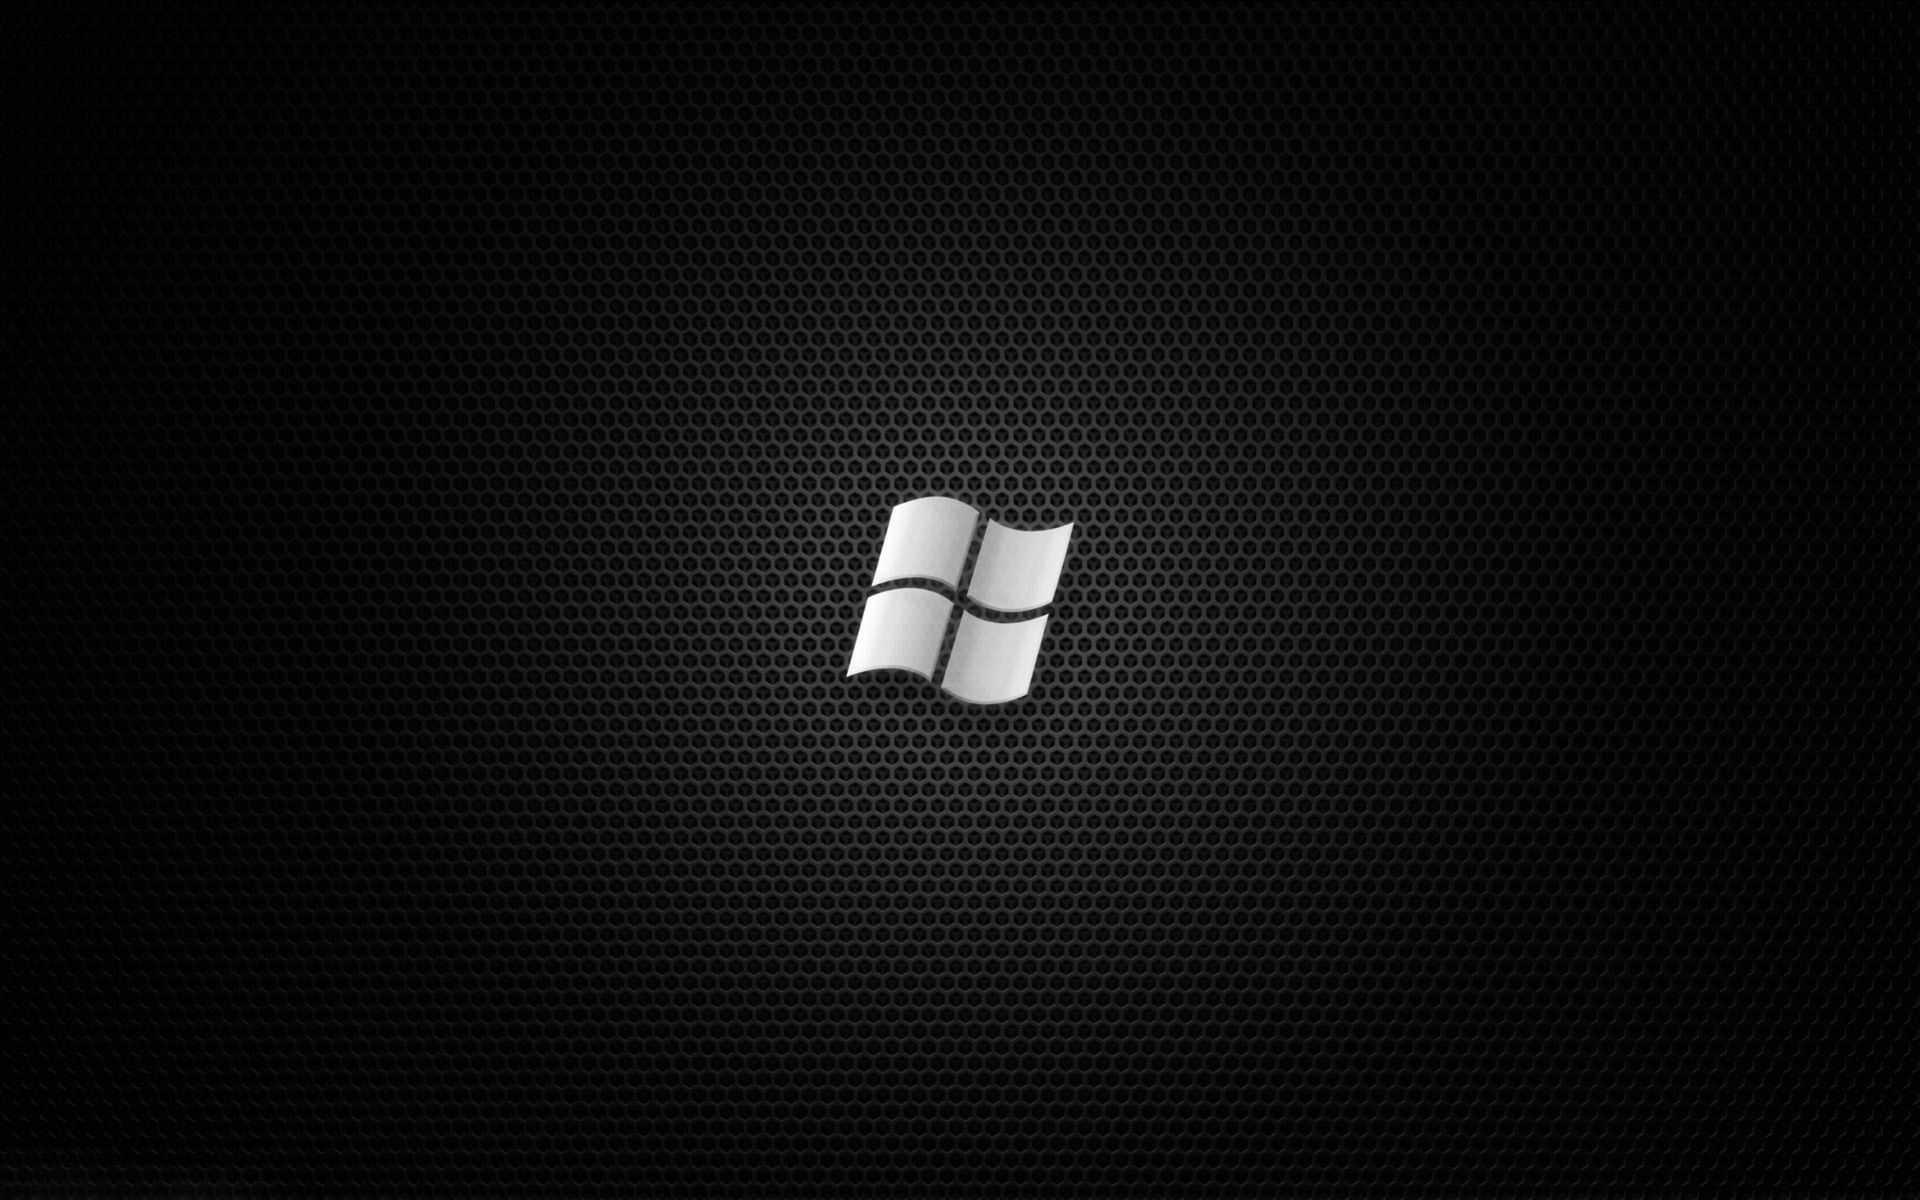 Hd Black And White For Windows Desktop Hd Wallpaper Wallpaper Pc Black Desktop Black Wallpaper